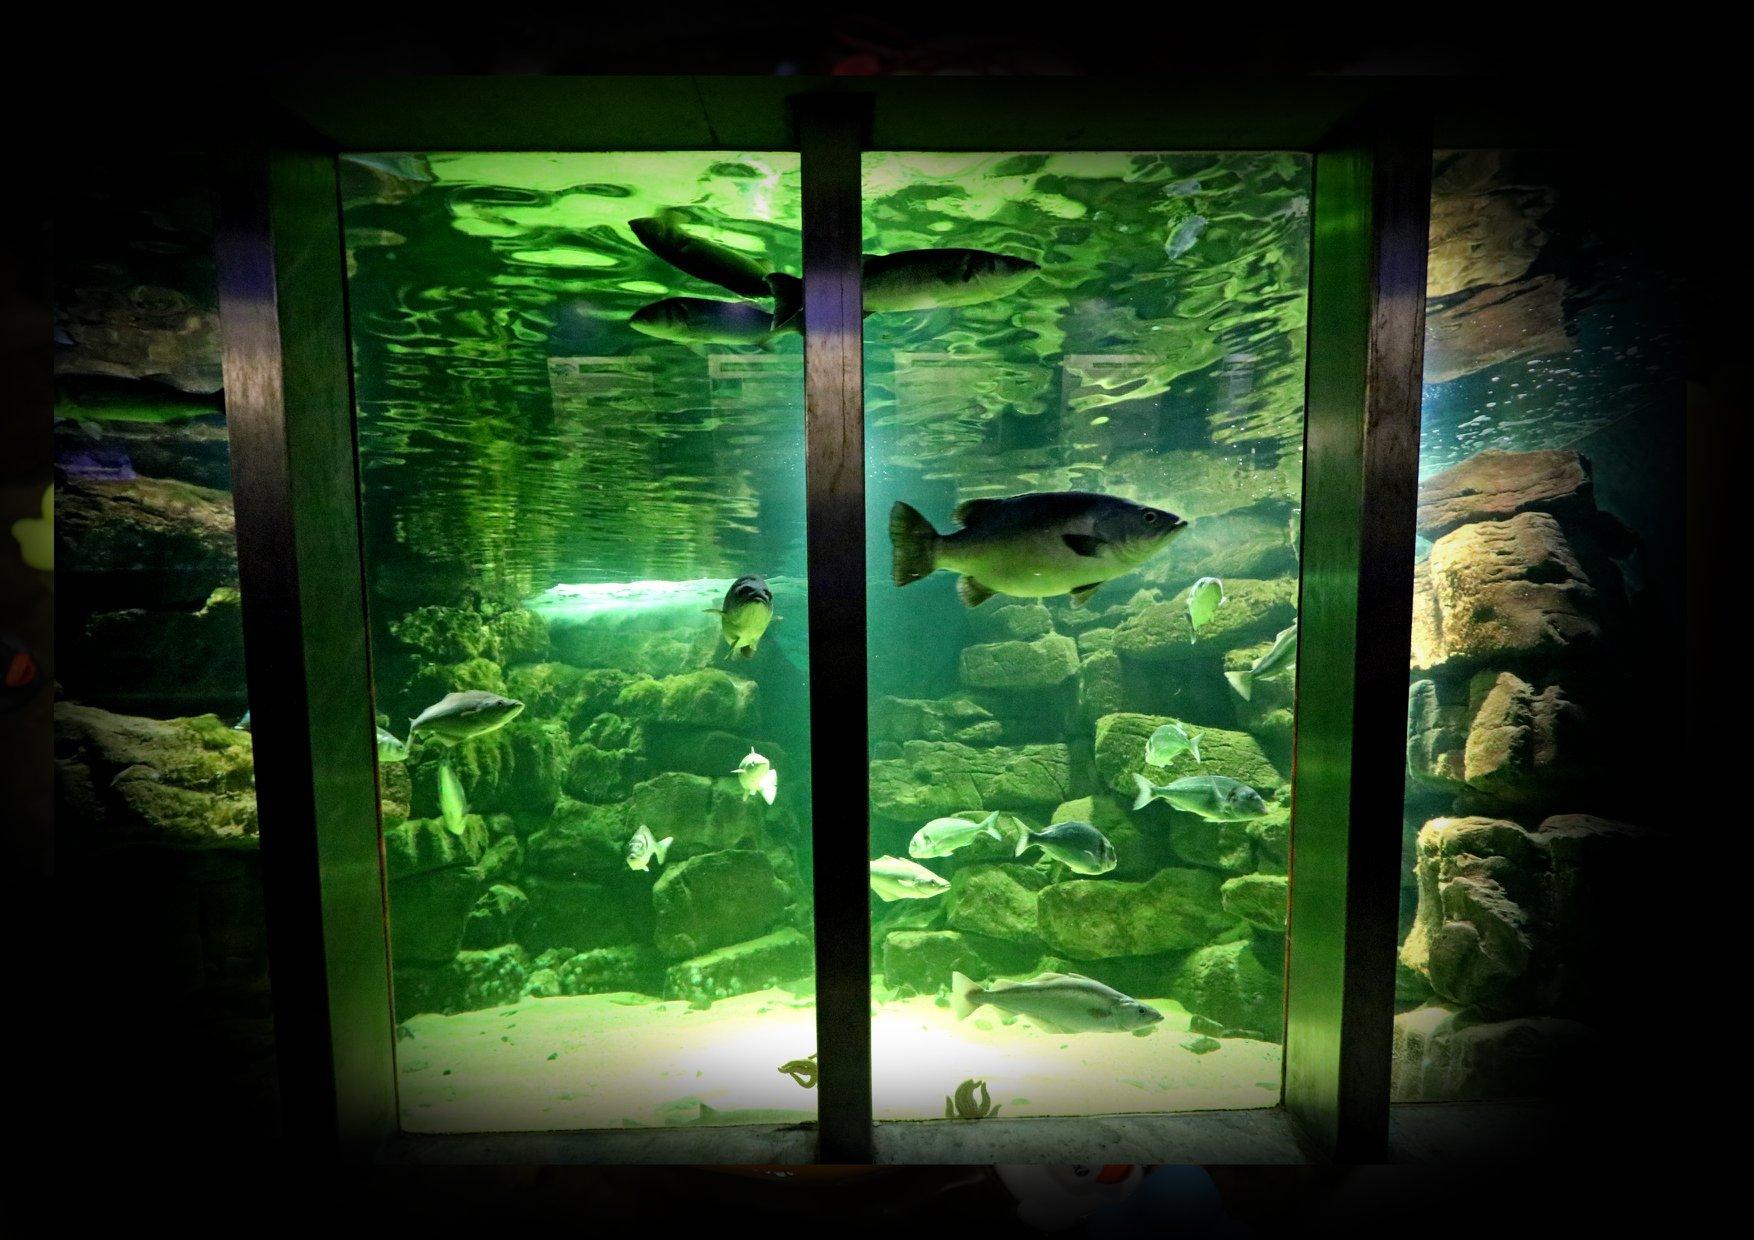 Galway Aquarium - Visit Galway